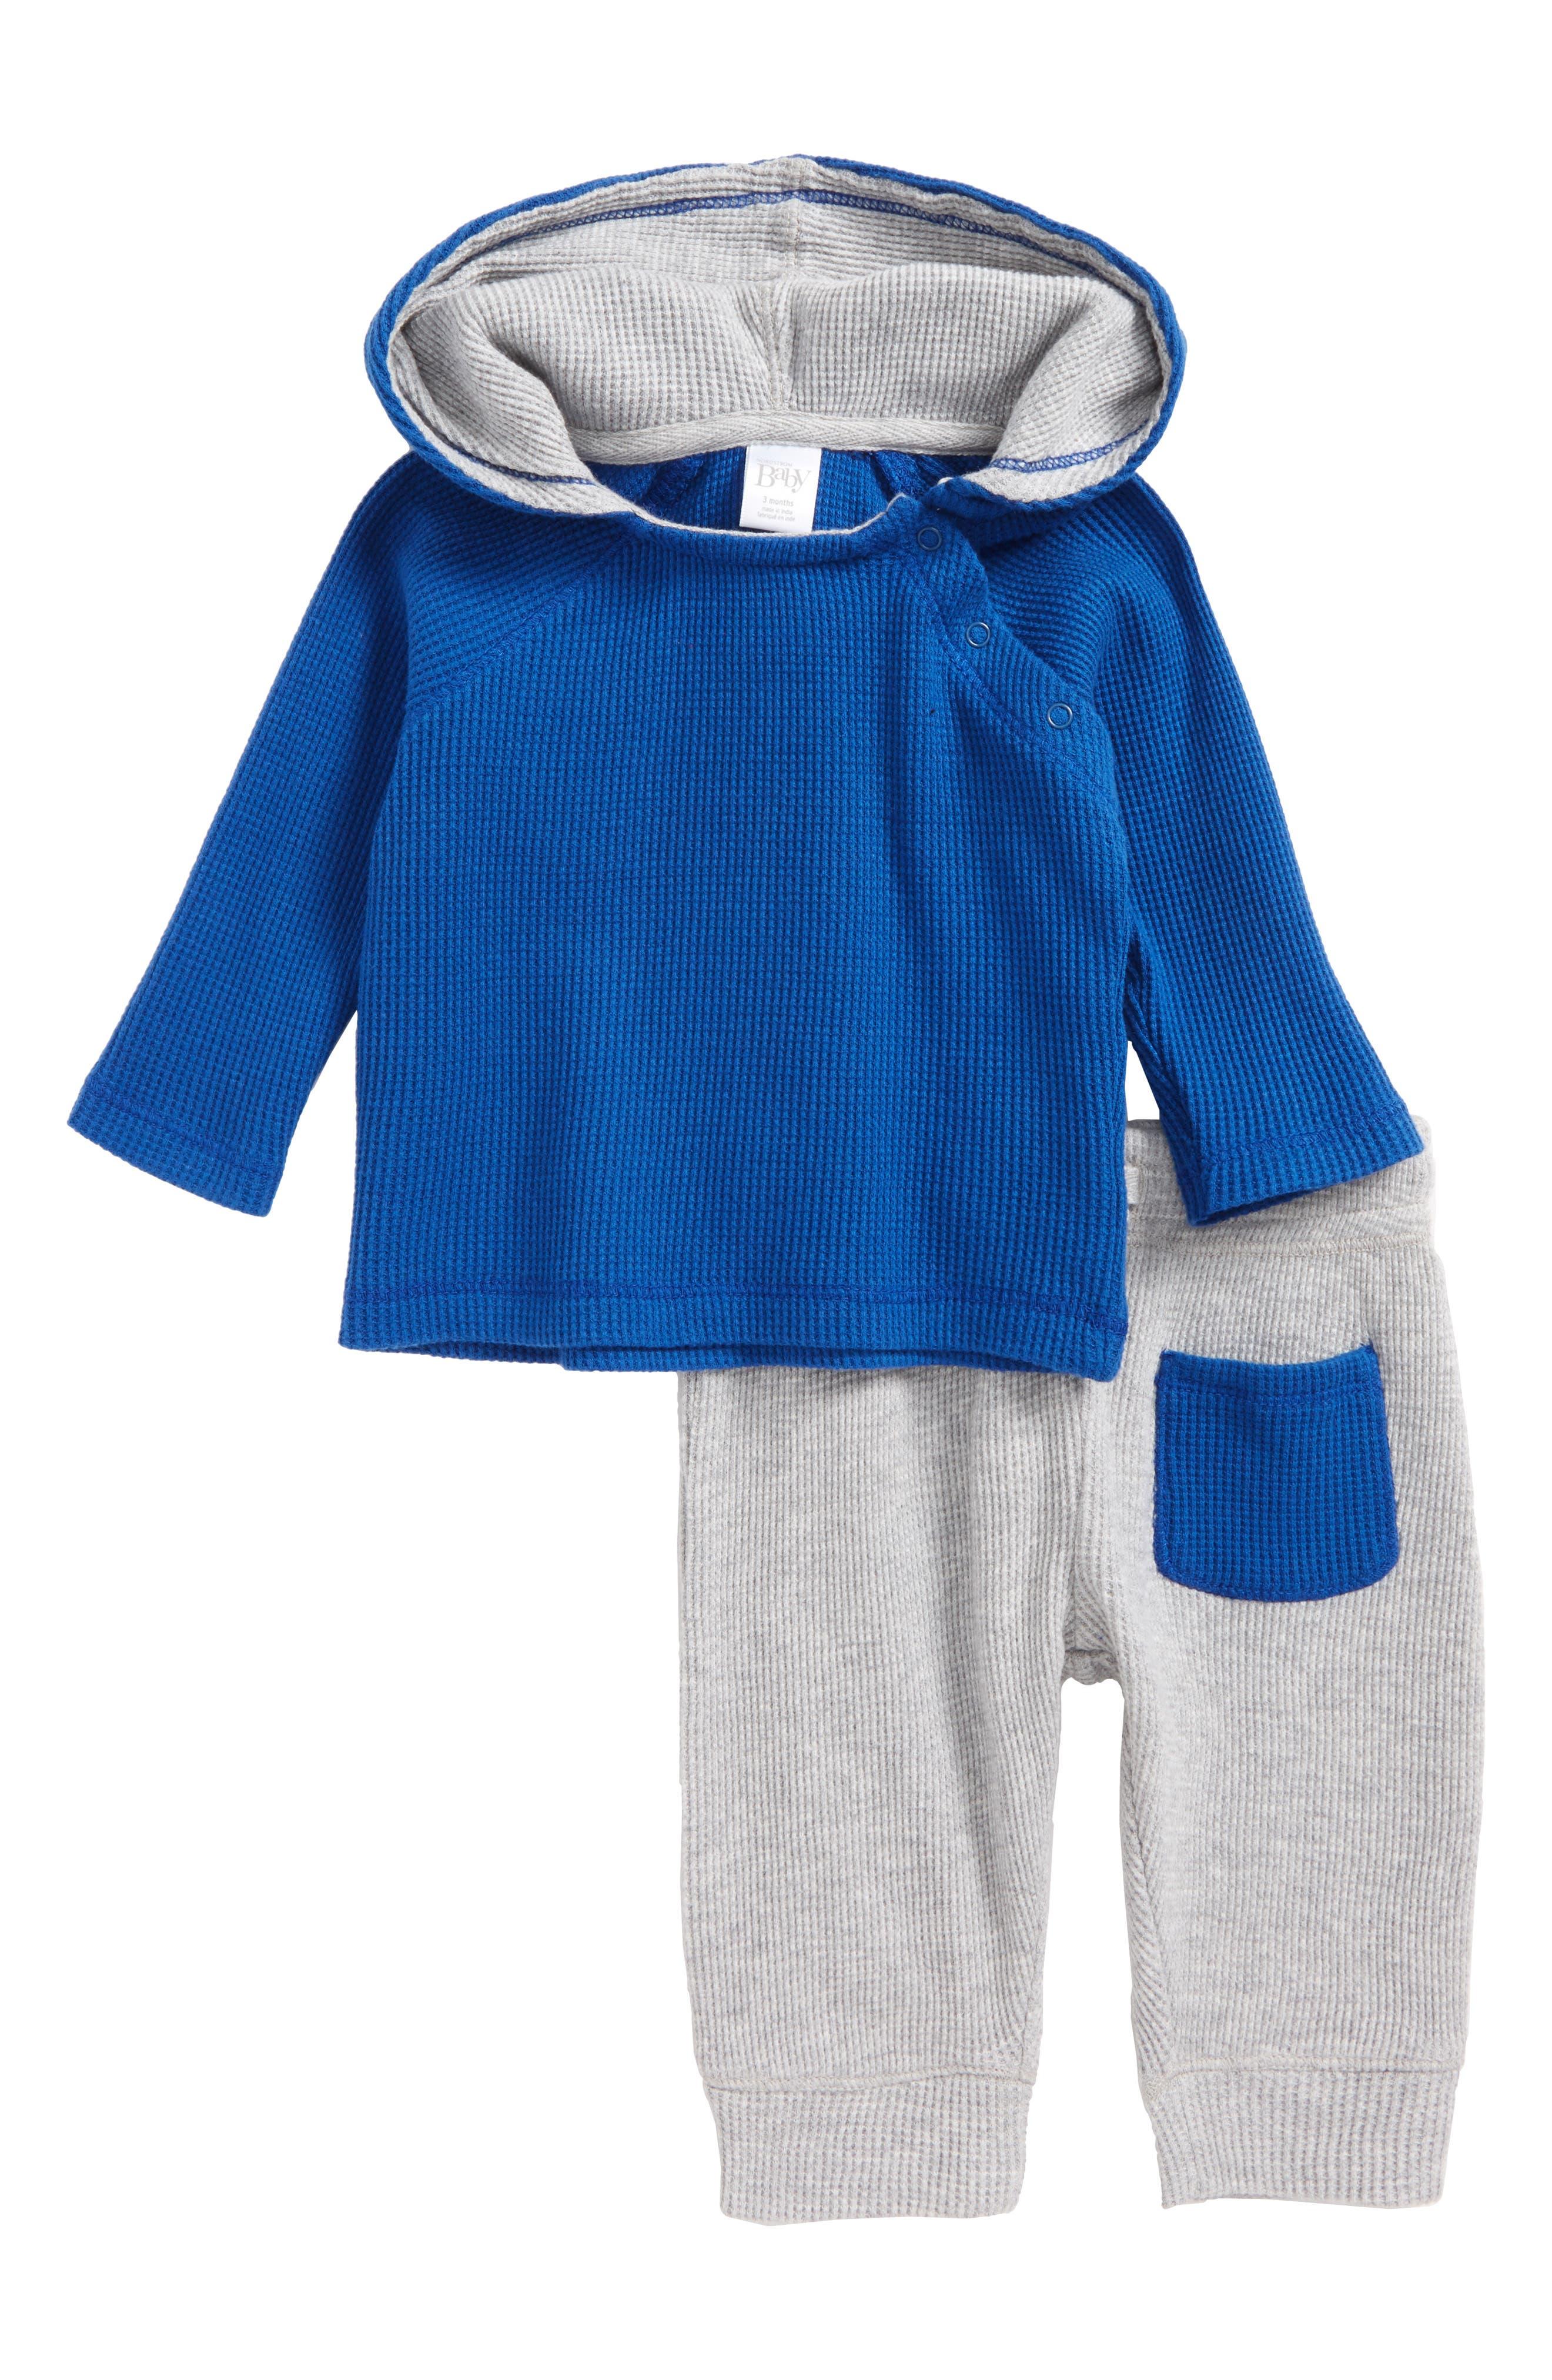 Main Image - Nordstrom Baby Thermal Hooded T-Shirt & Pants Set (Baby Boys)